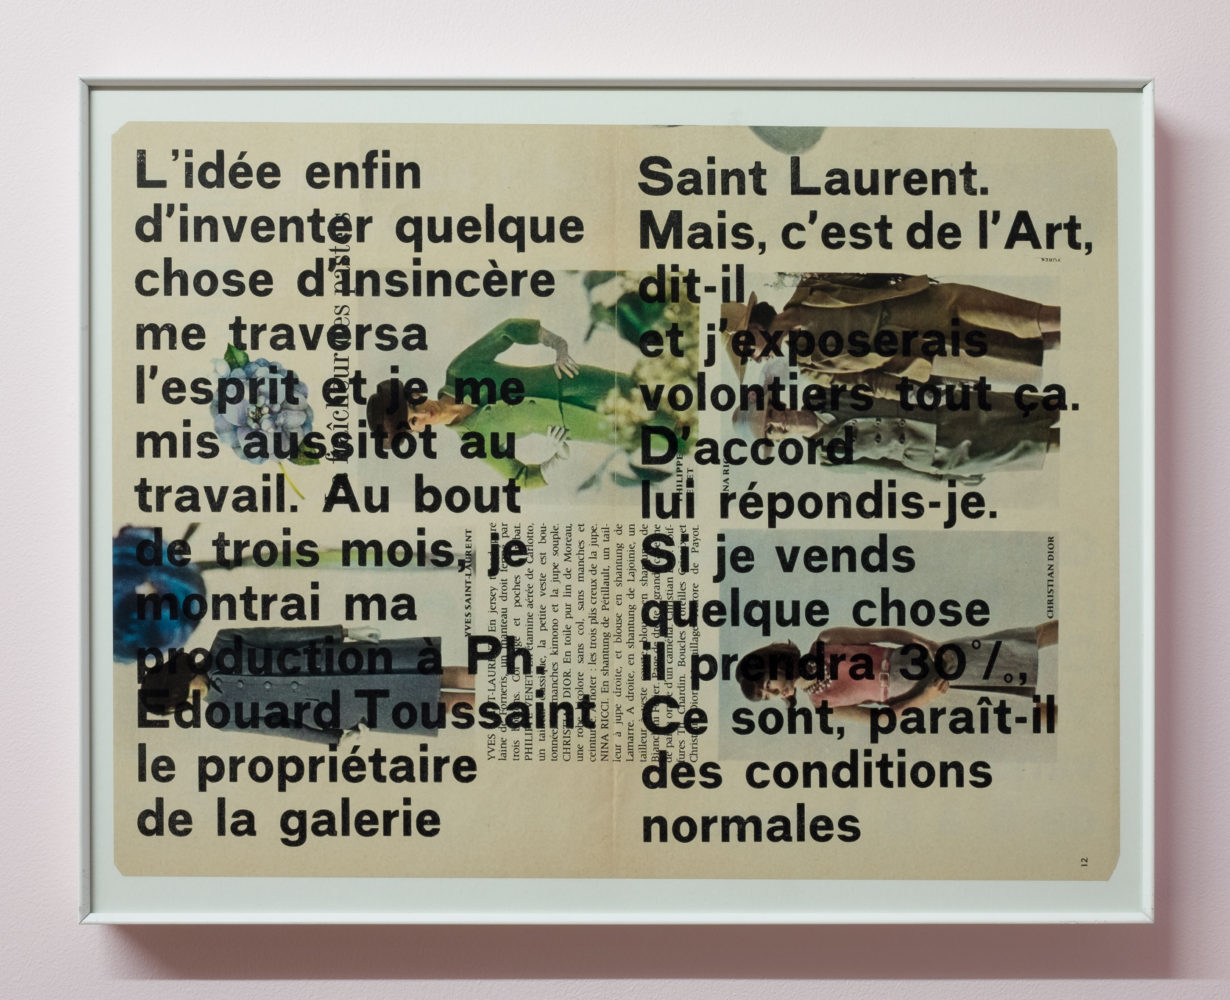 P!, o_u_DSF4782_low_res Marcel Broodthaers, Moi aussi, je me suis demandé si je ne pouvais pas vendre quelque chose et réussir dans la vie . . . (I, too, wondered whether I could not sell something and succeed in life…), 1964